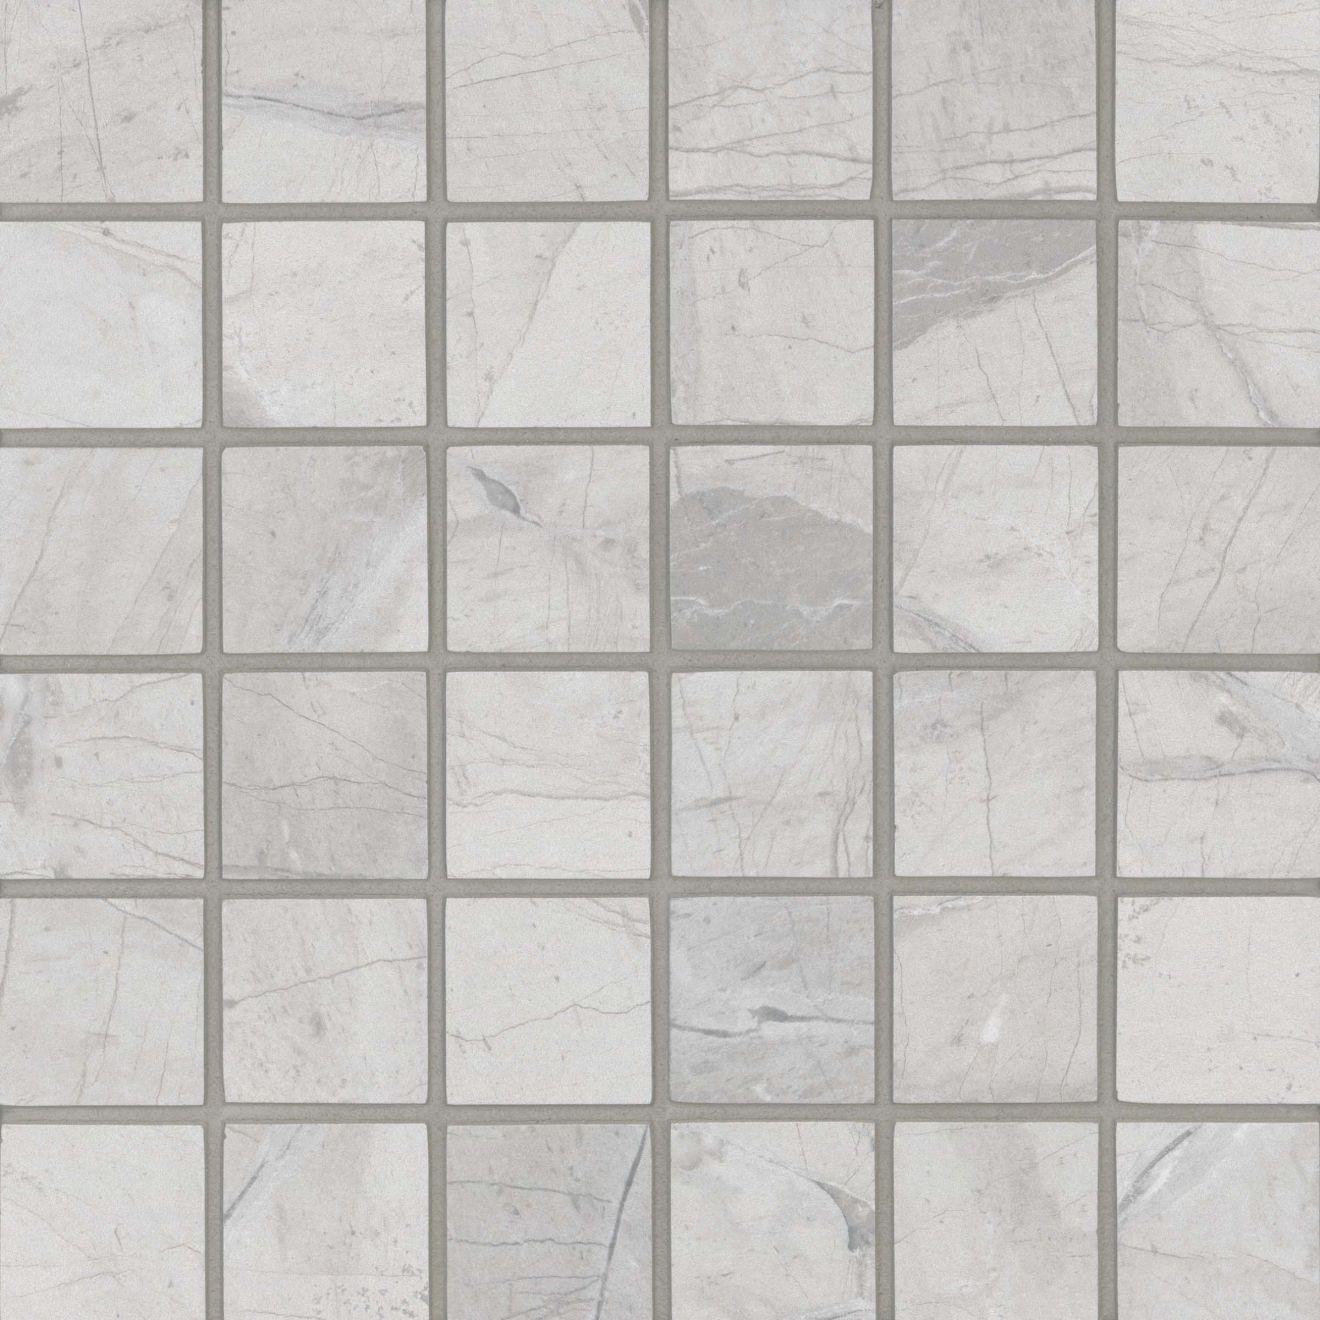 Tesoro Wall Mosaic in White